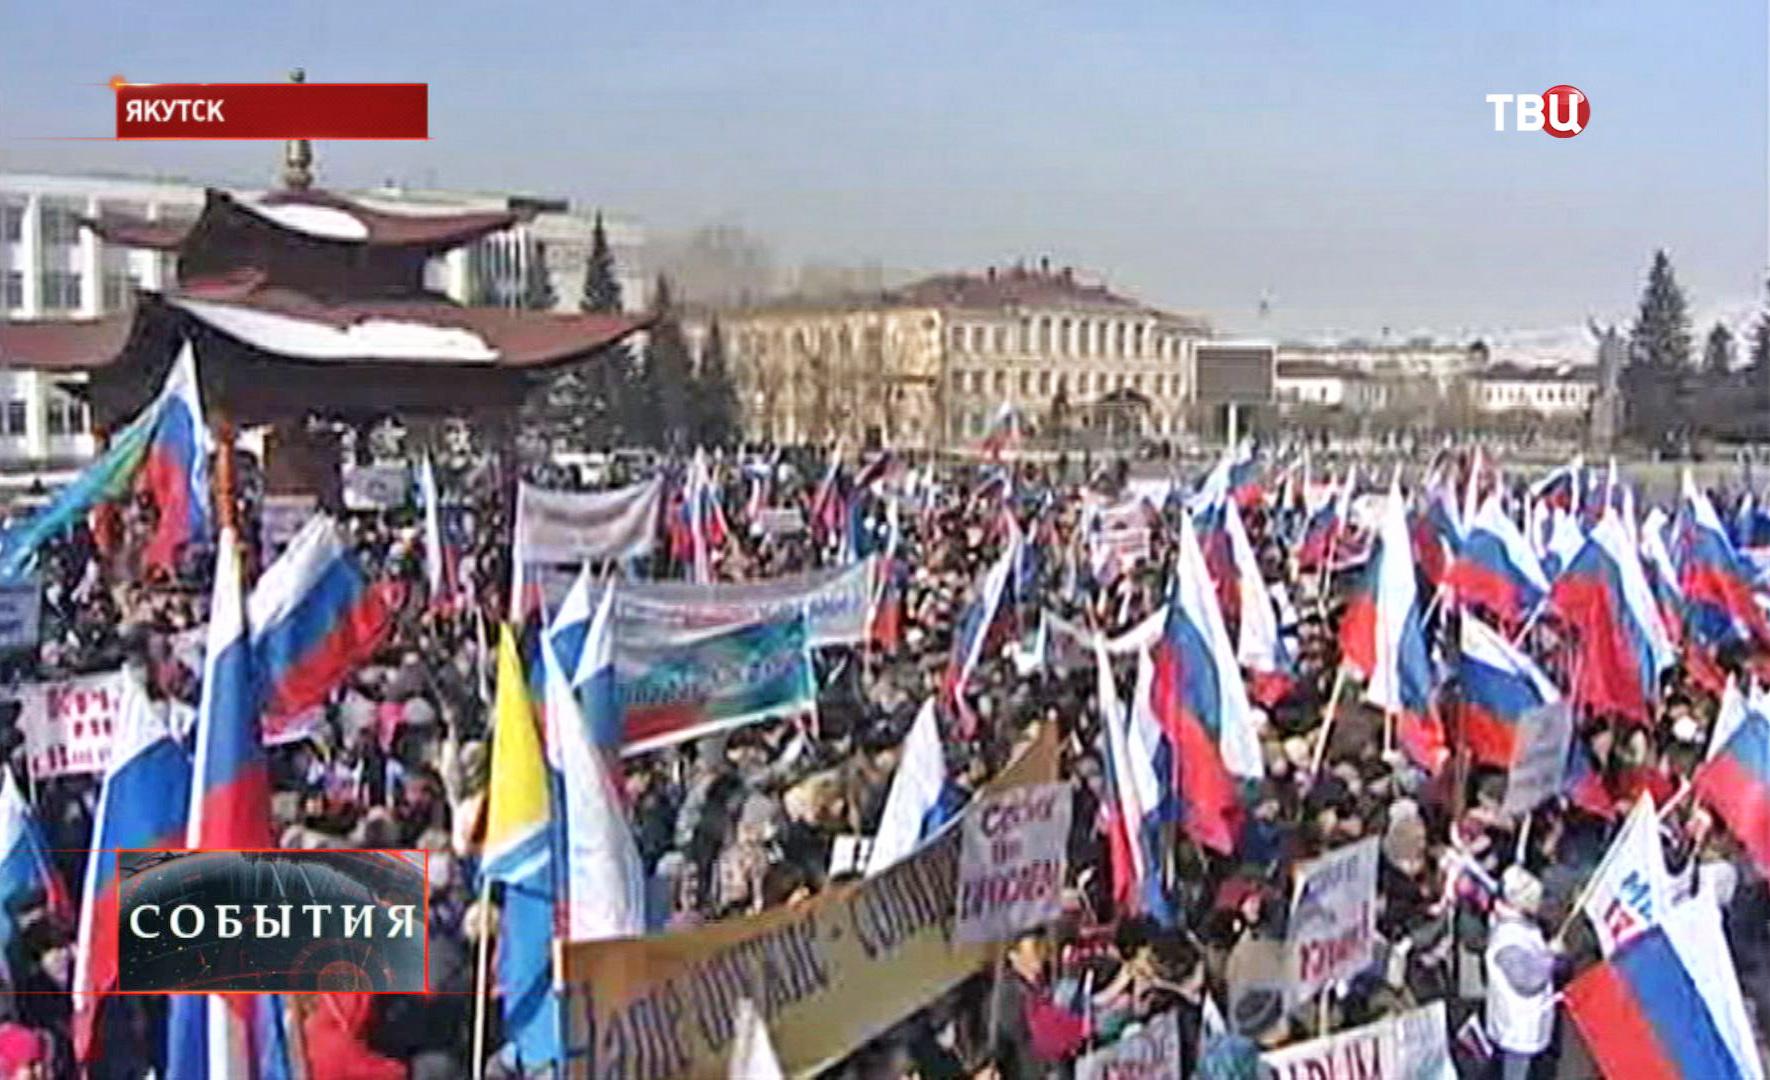 Митинг в Якутске